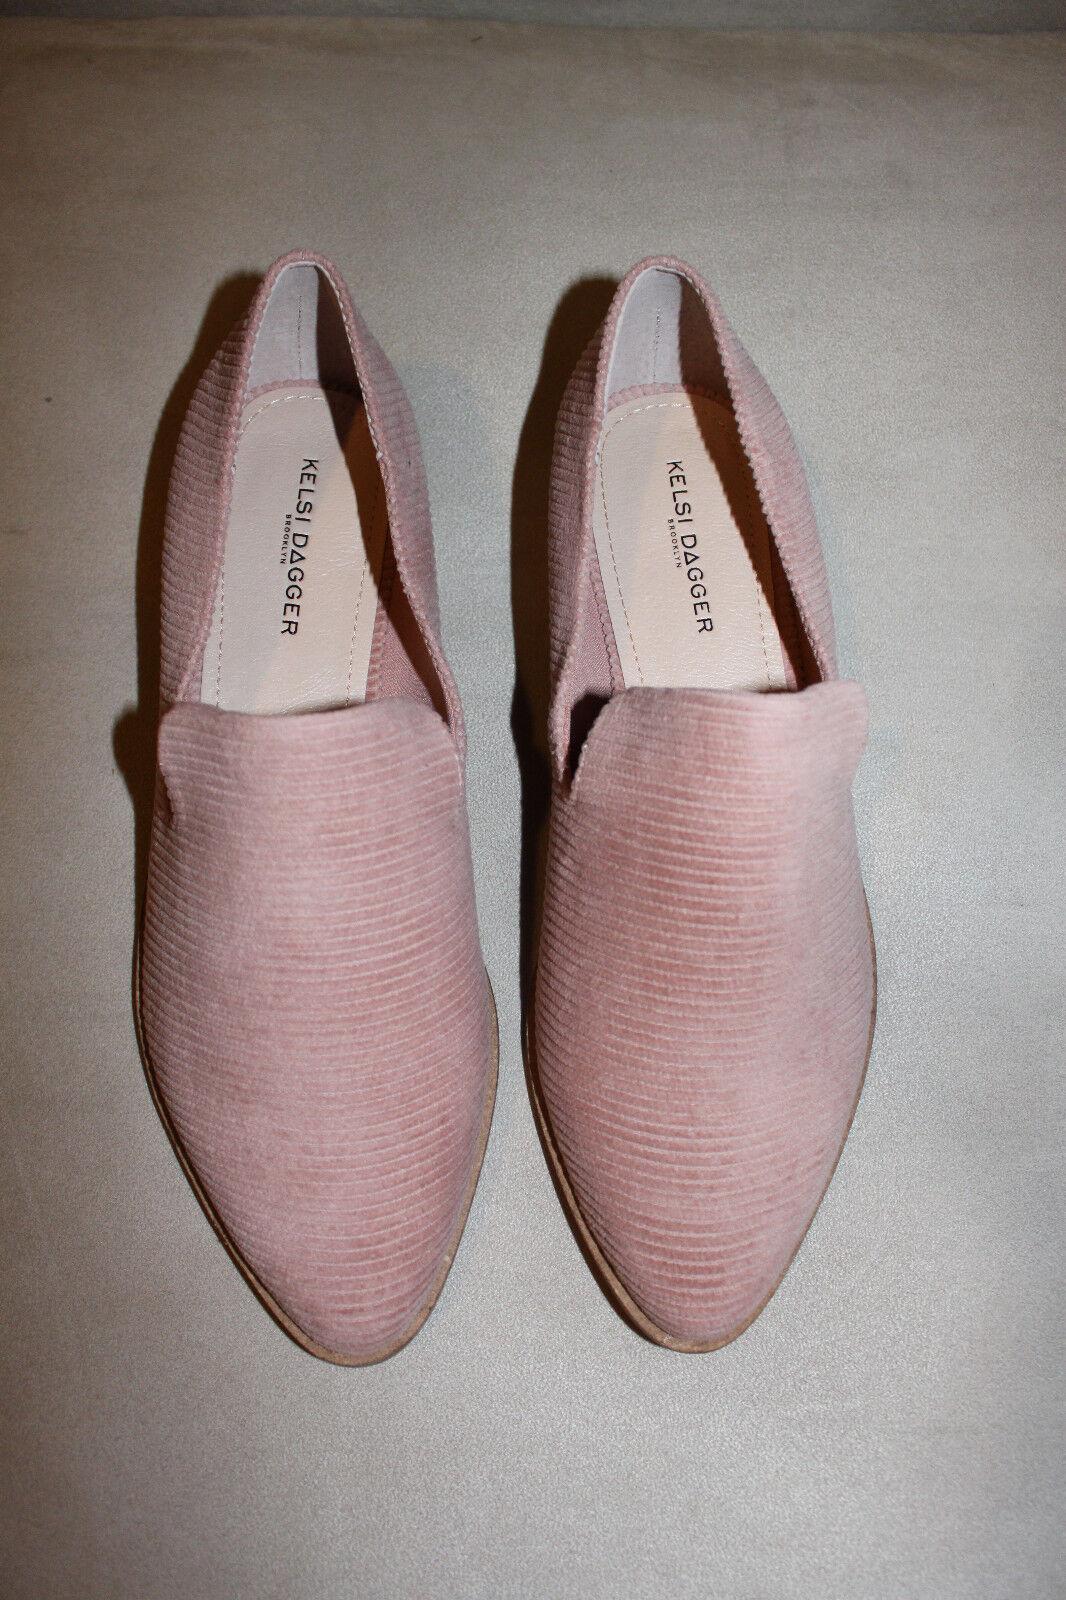 Anthropologie Kelsi Kelsi Kelsi Dagger Arbor Pana Mocasines chatos Slip On Zapatos rosado 10  hasta un 50% de descuento